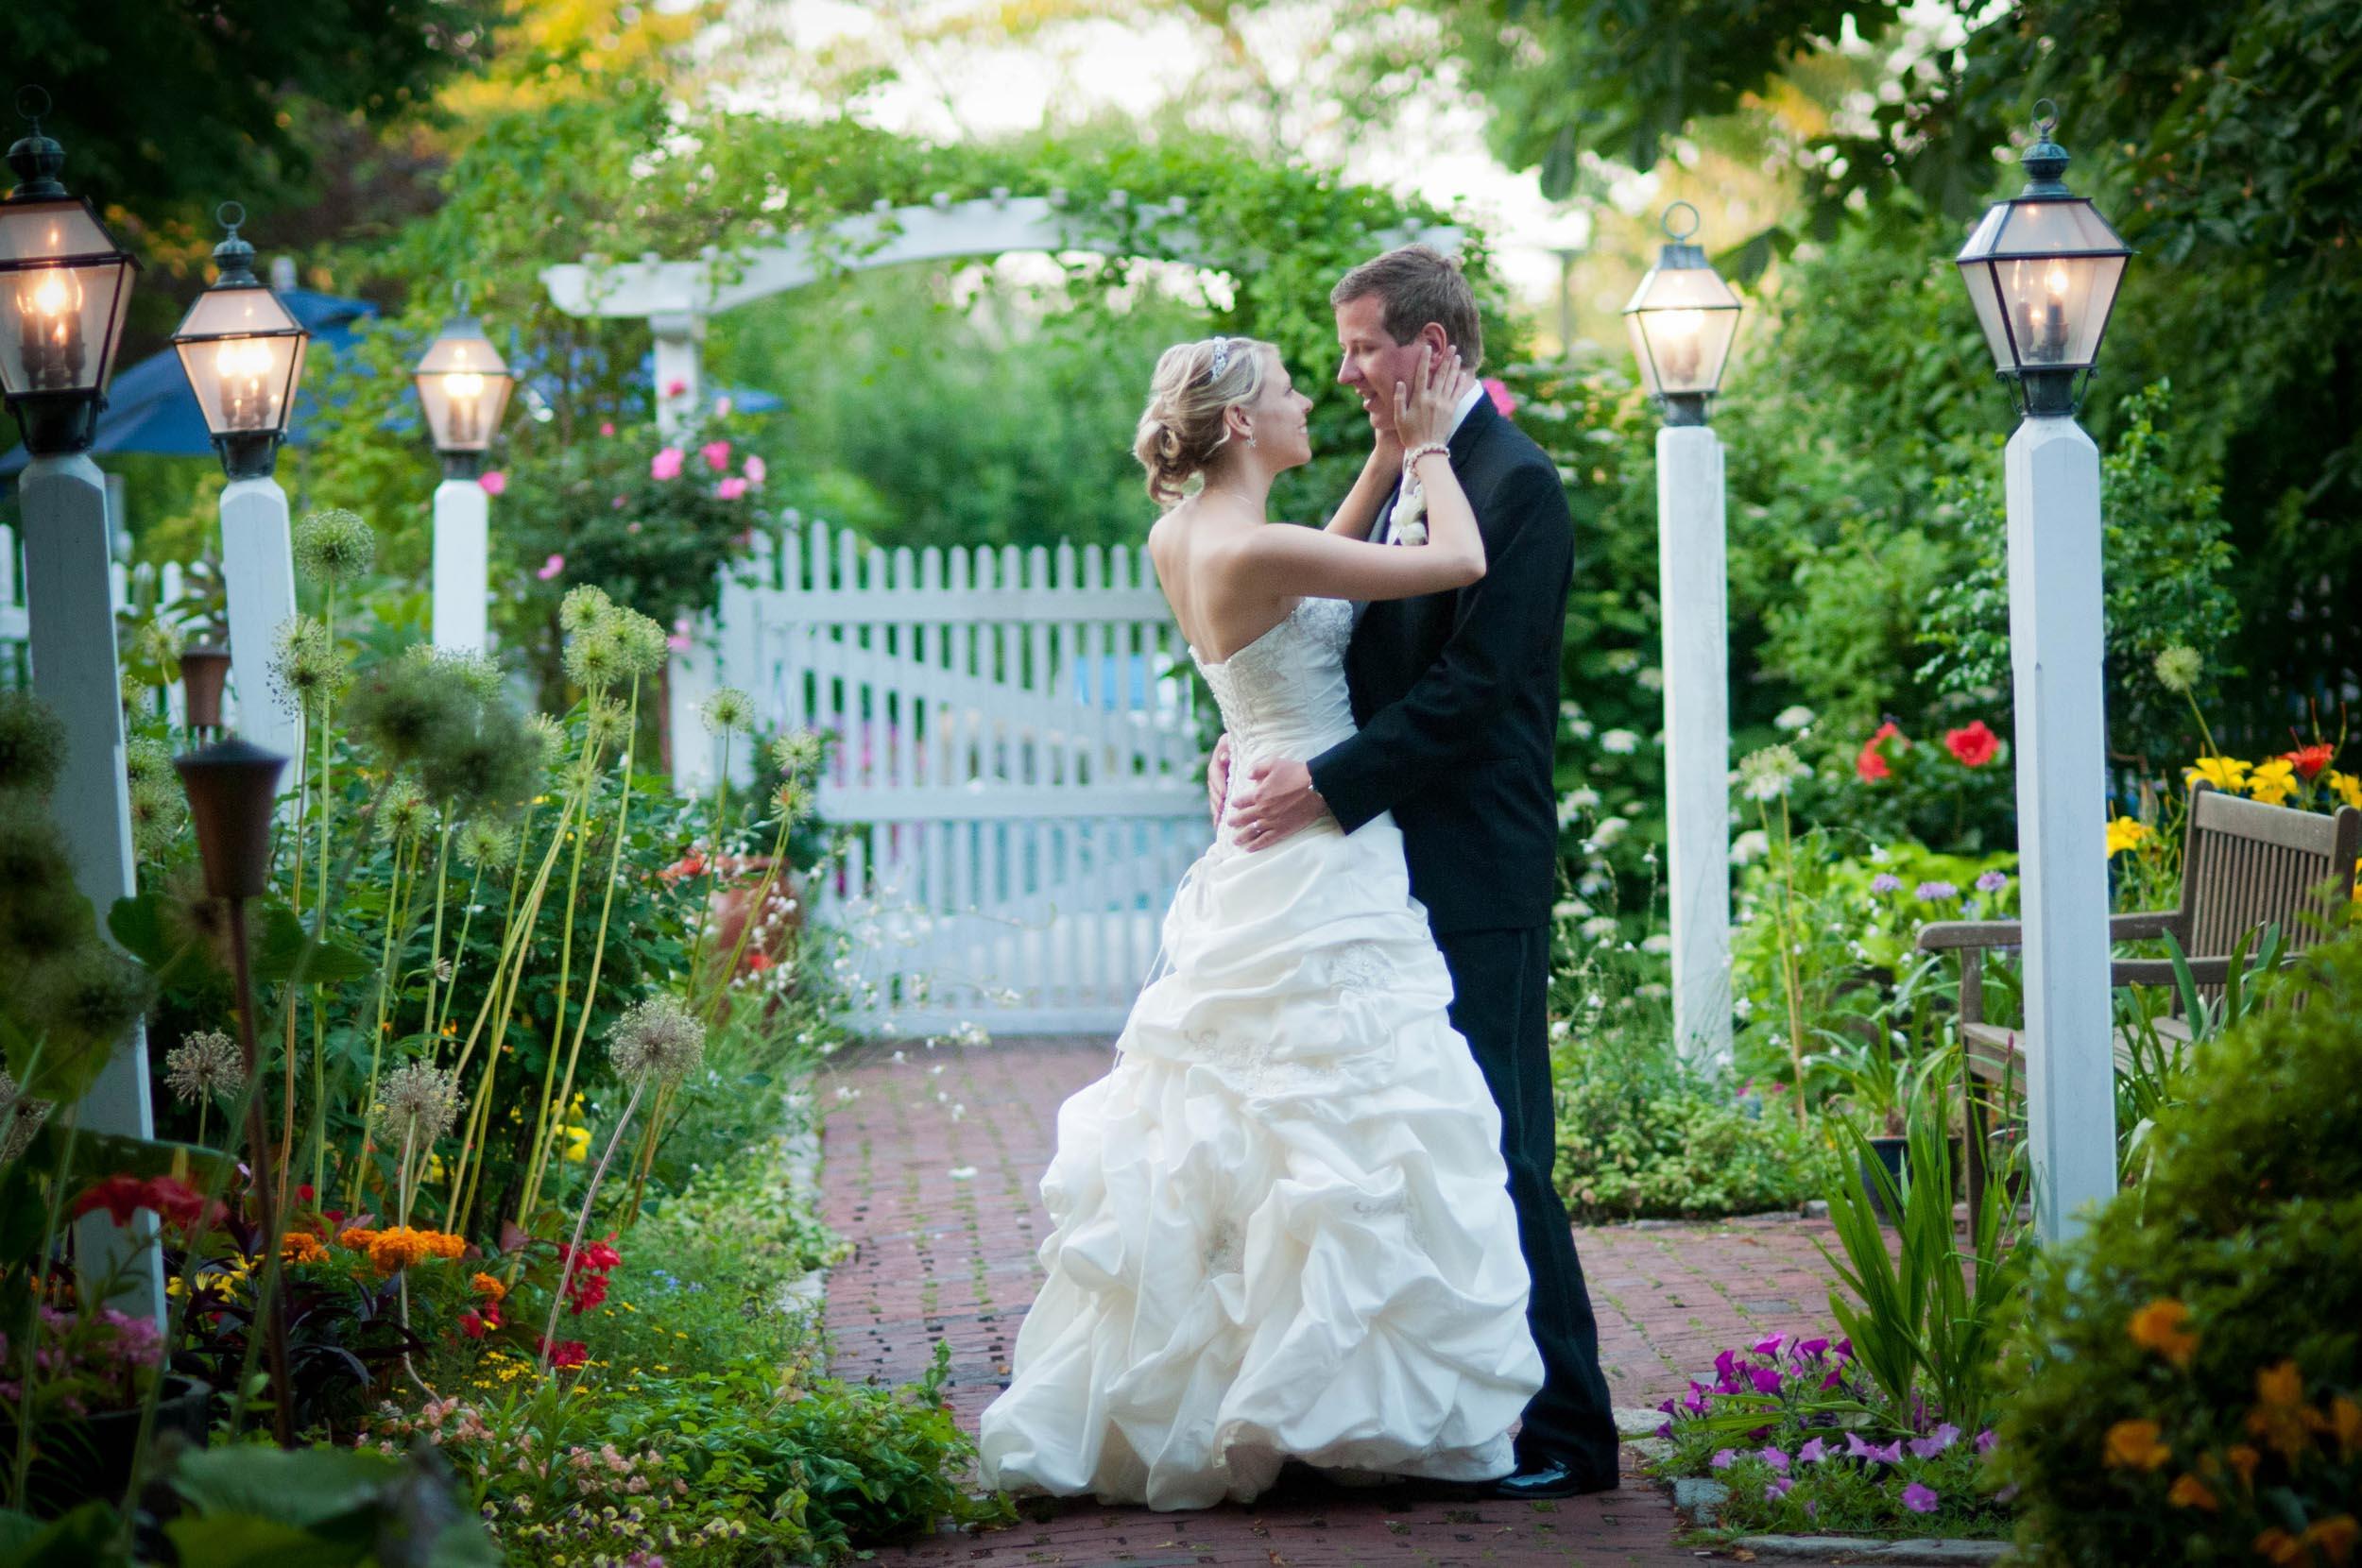 Wedding11G&C-001-2.jpg